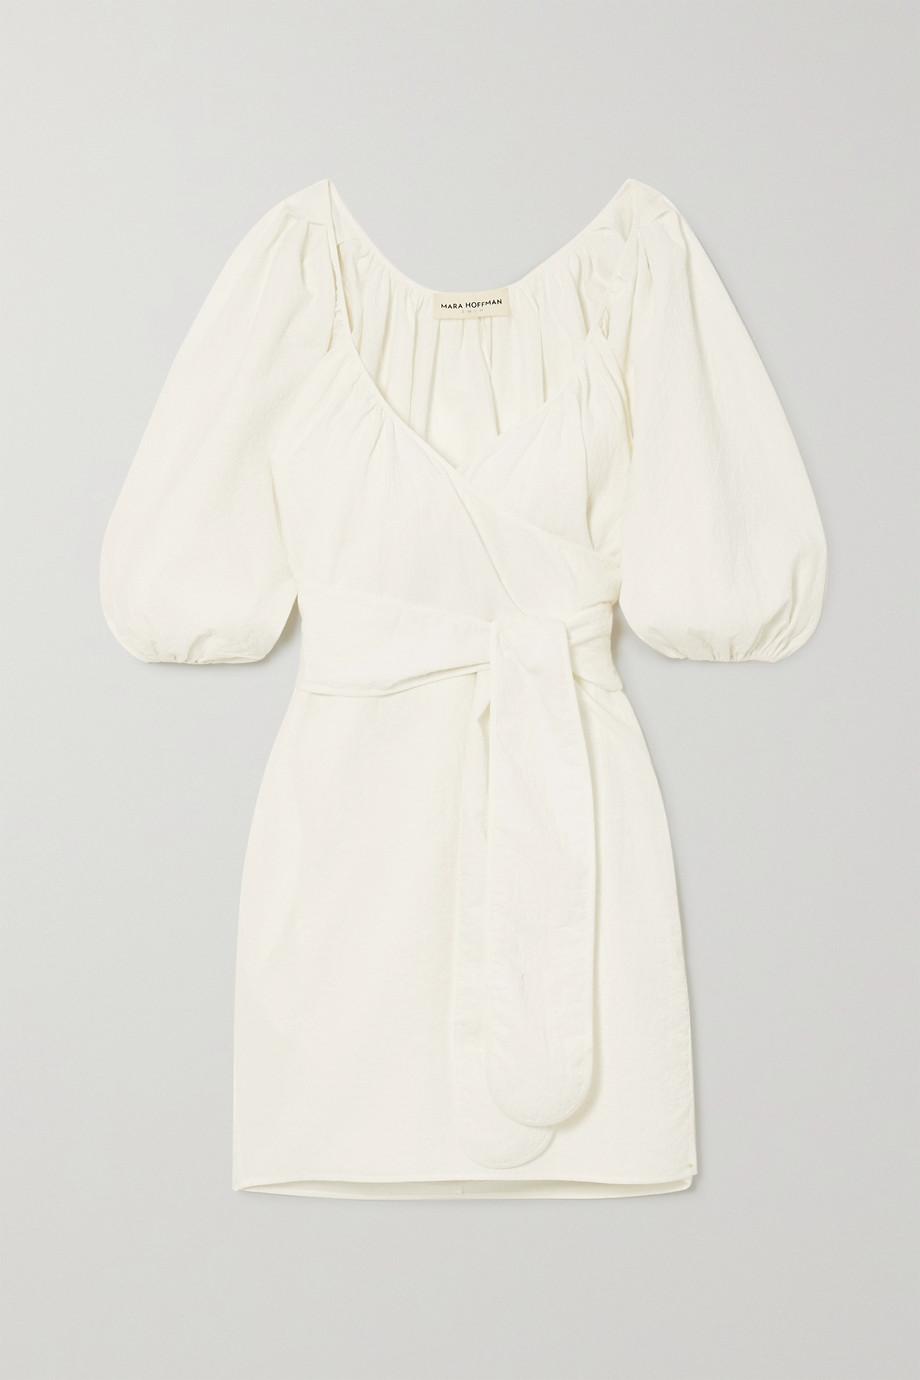 Mara Hoffman + NET SUSTAIN x LG Electronics Coletta crinkled organic cotton wrap mini dress